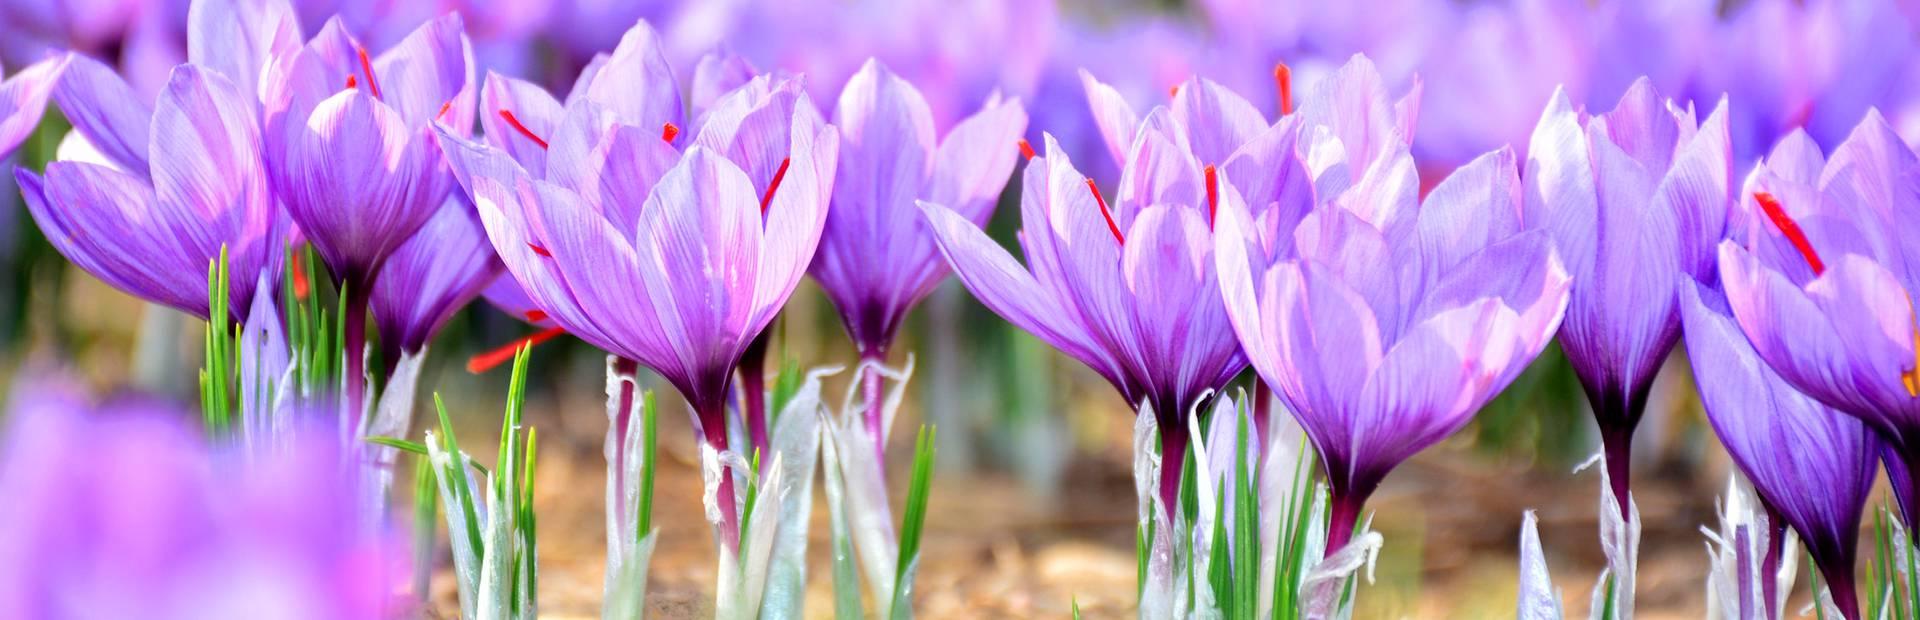 Fleurs de safran en Pays Bigouden © M Amiri